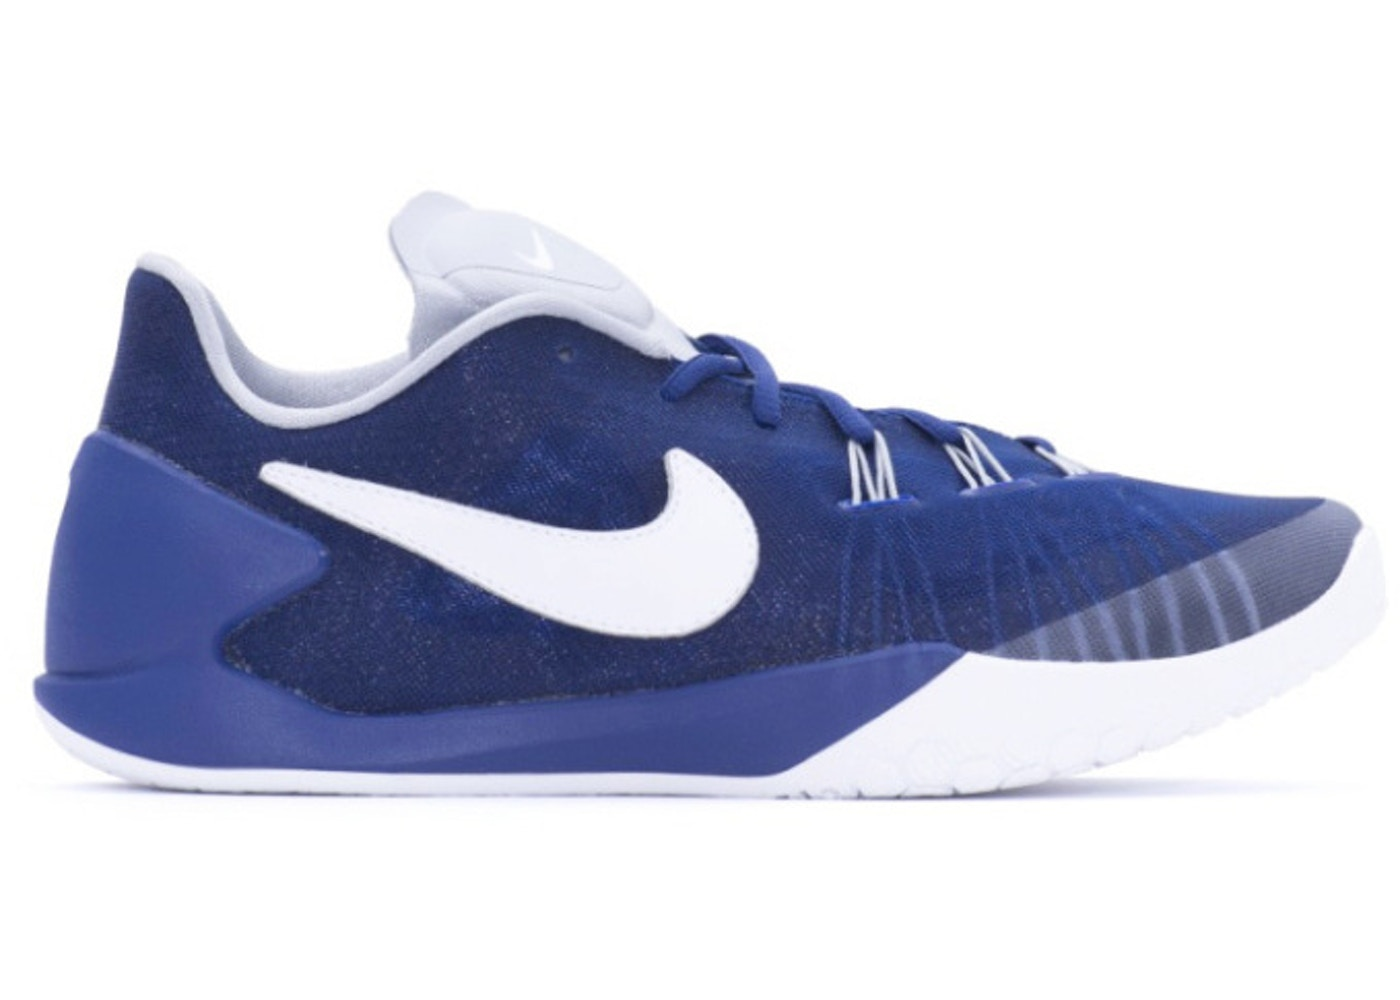 34005868efd0 Nike Hyperchase Fragment Royal - 789486-410